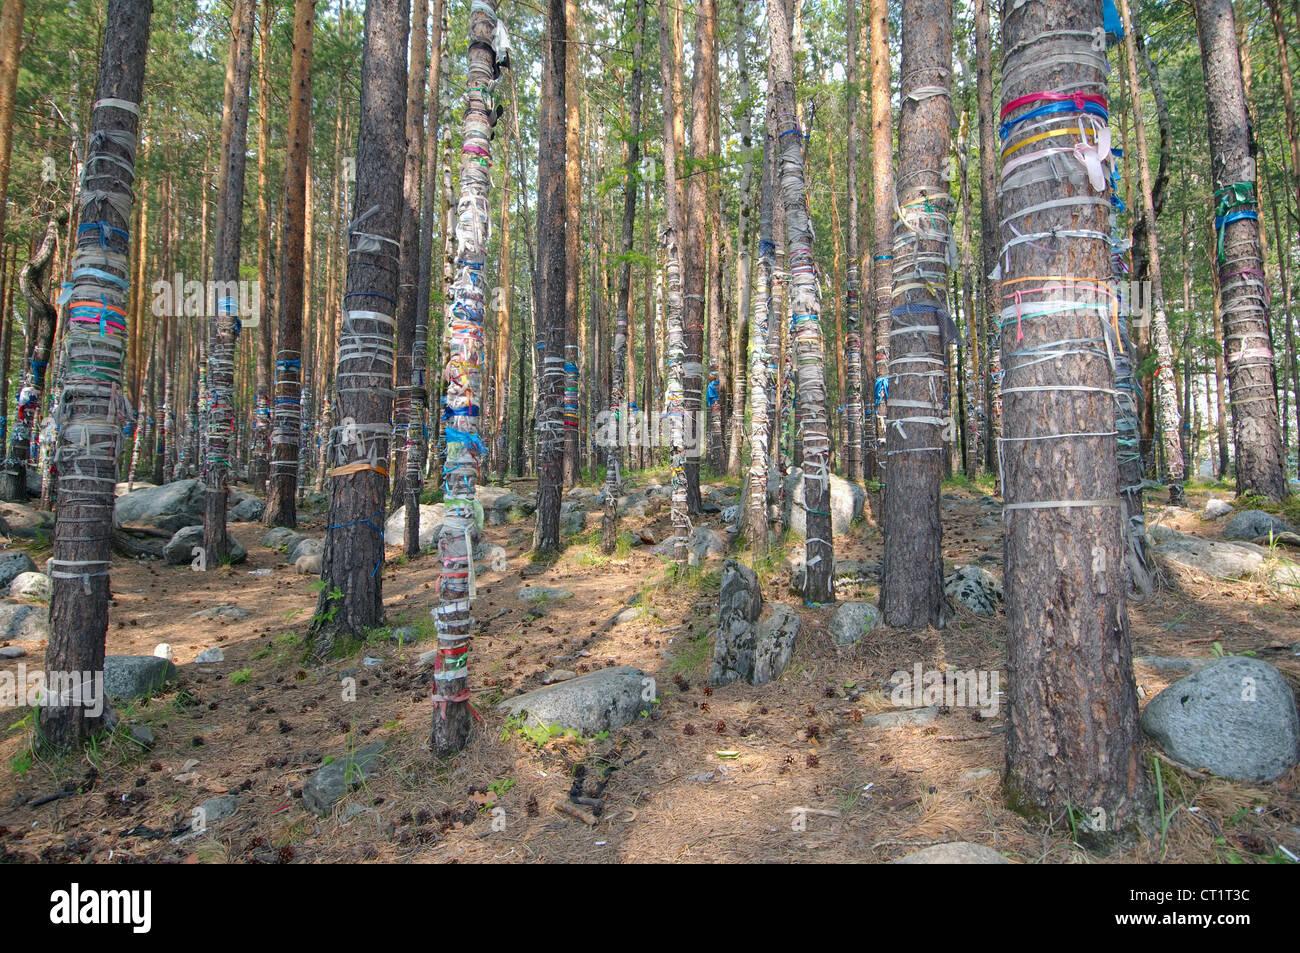 the sacred grove, Arshan, Tunkinsky District, Republic of Buryatia, Siberia, Russian Federation - Stock Image